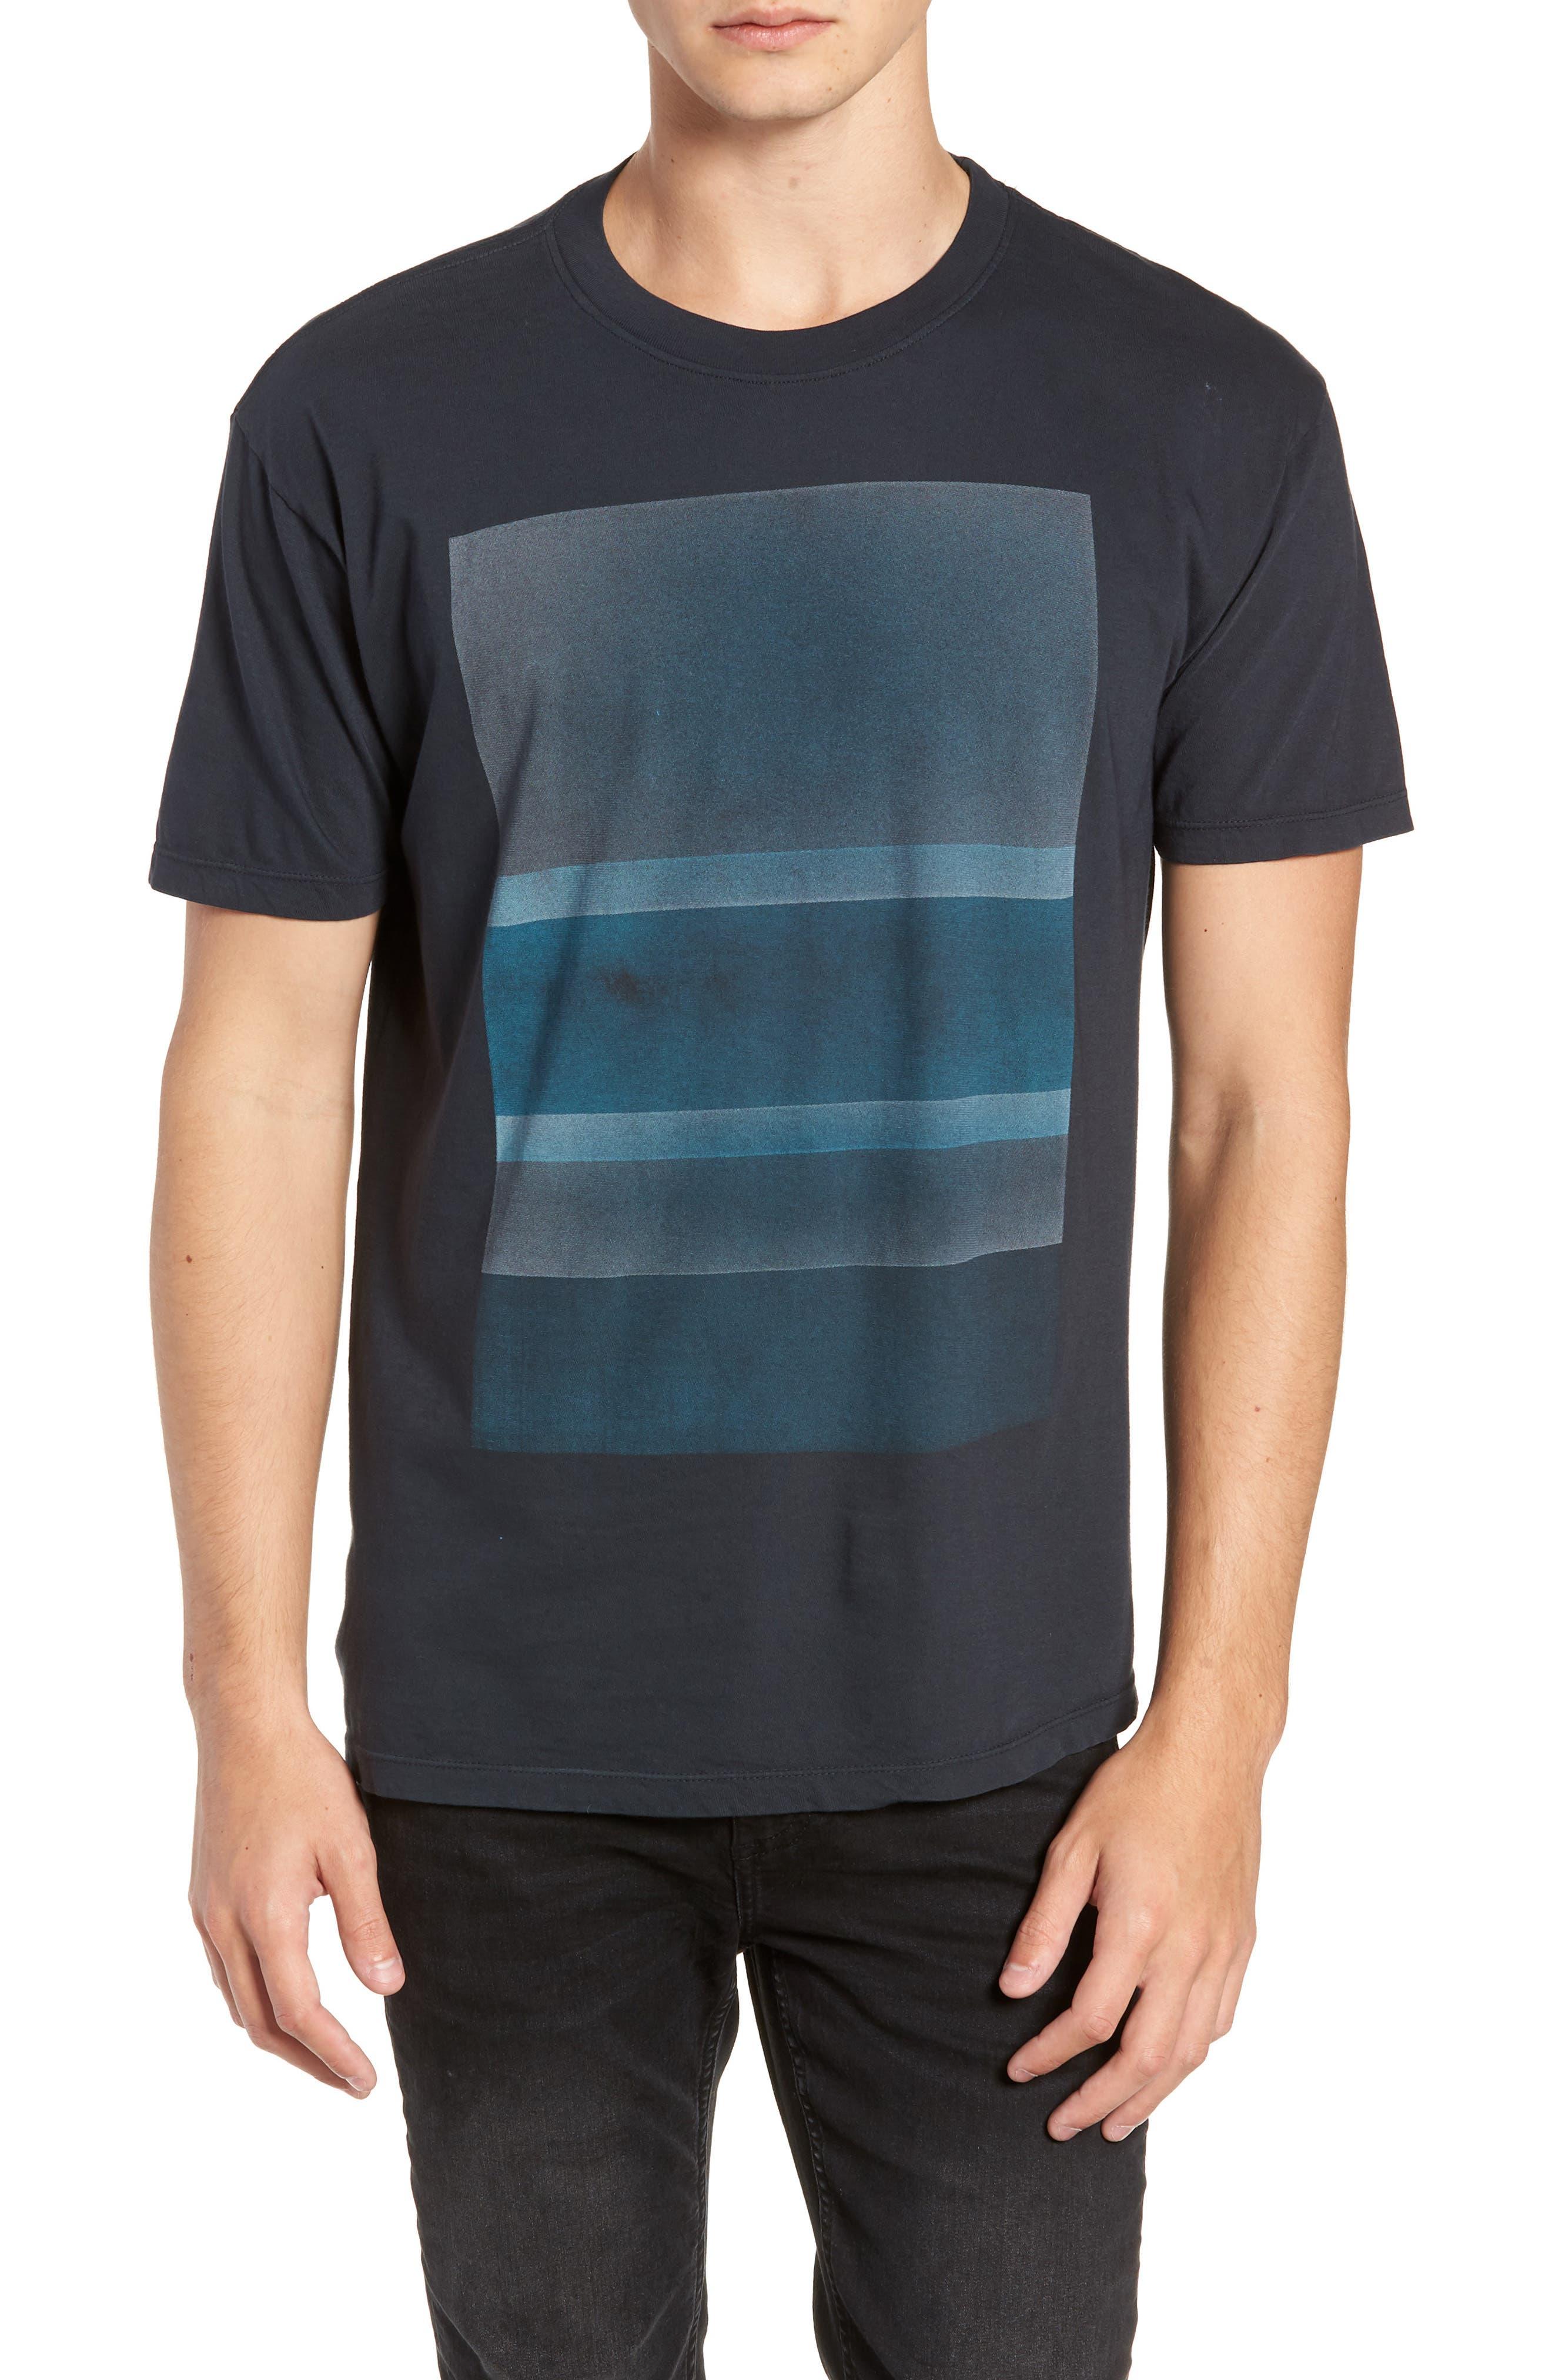 Motion Graphic T-Shirt,                             Main thumbnail 1, color,                             BLACK